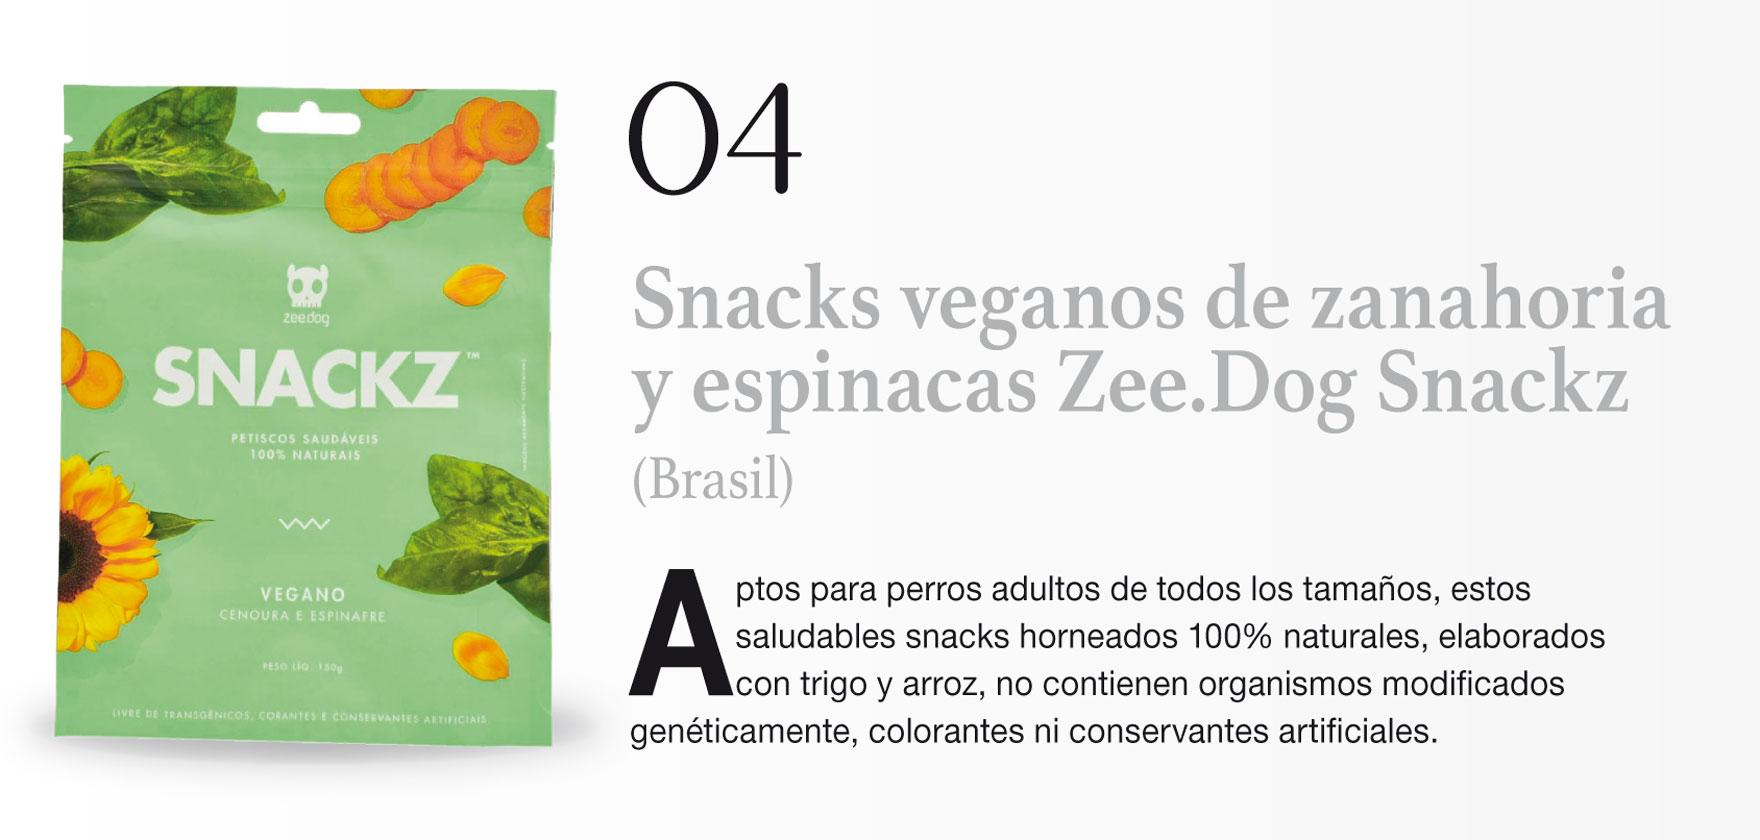 Snacks veganos de zanahoria y espinacas Zee.Dog Snackz (Brasil)